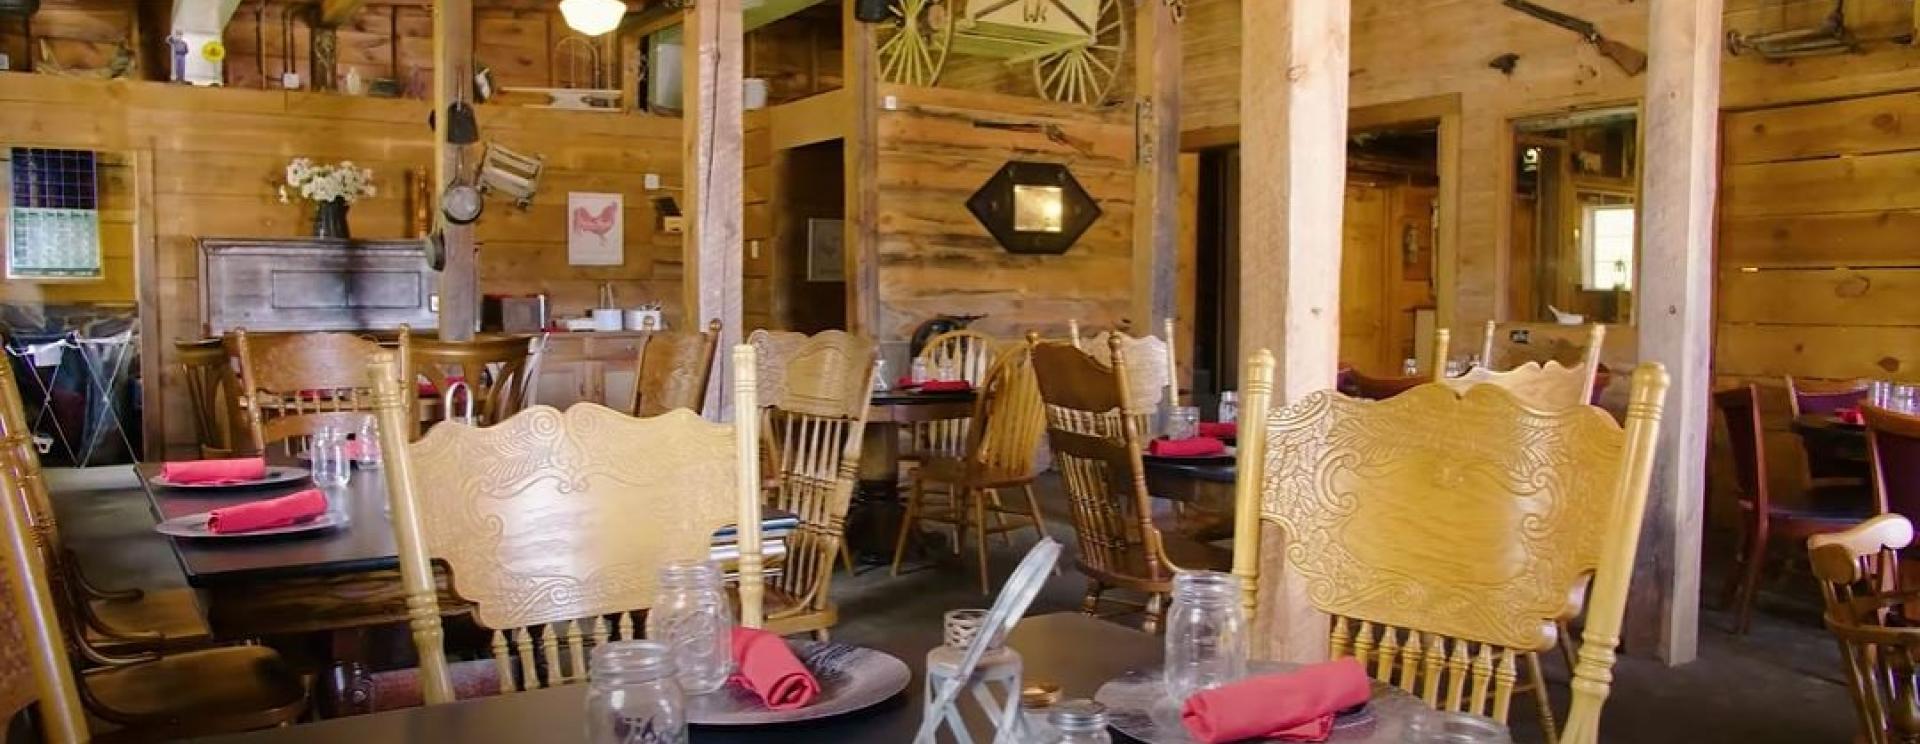 Chute Rooster Restaurant & Bar